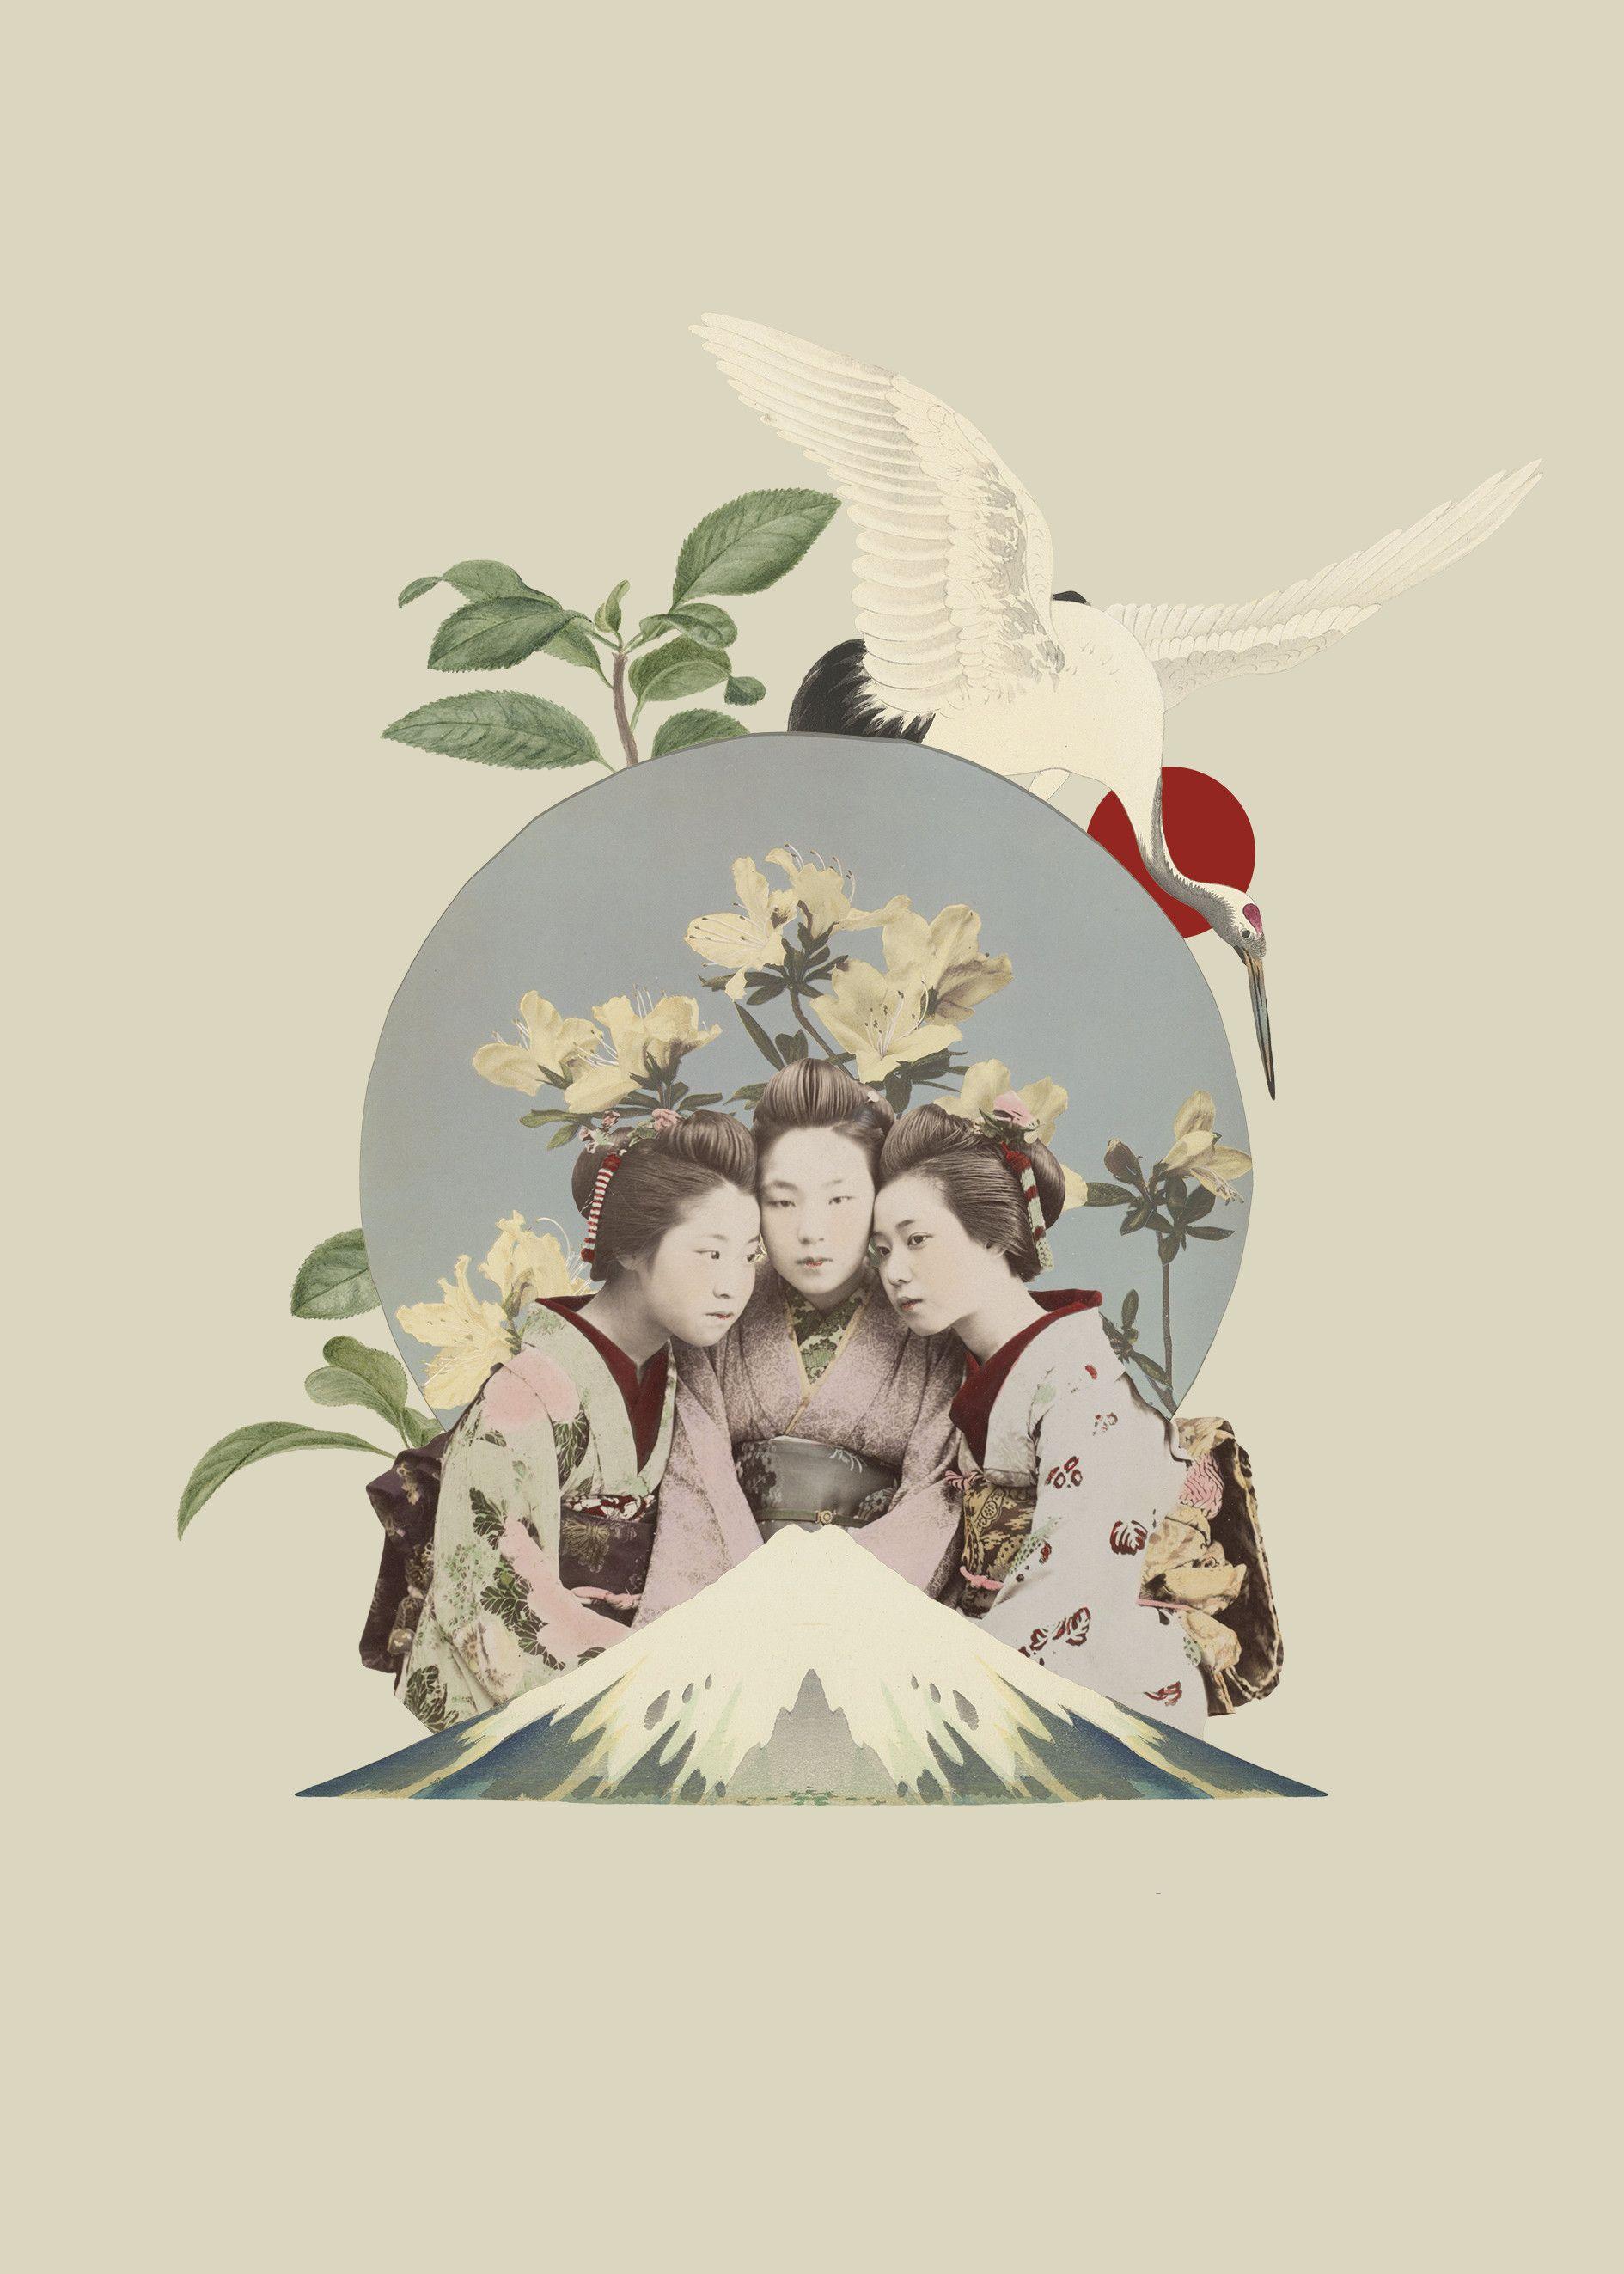 Collage Poster Japan Kolaz Plakat Dekoracyjny Japonia